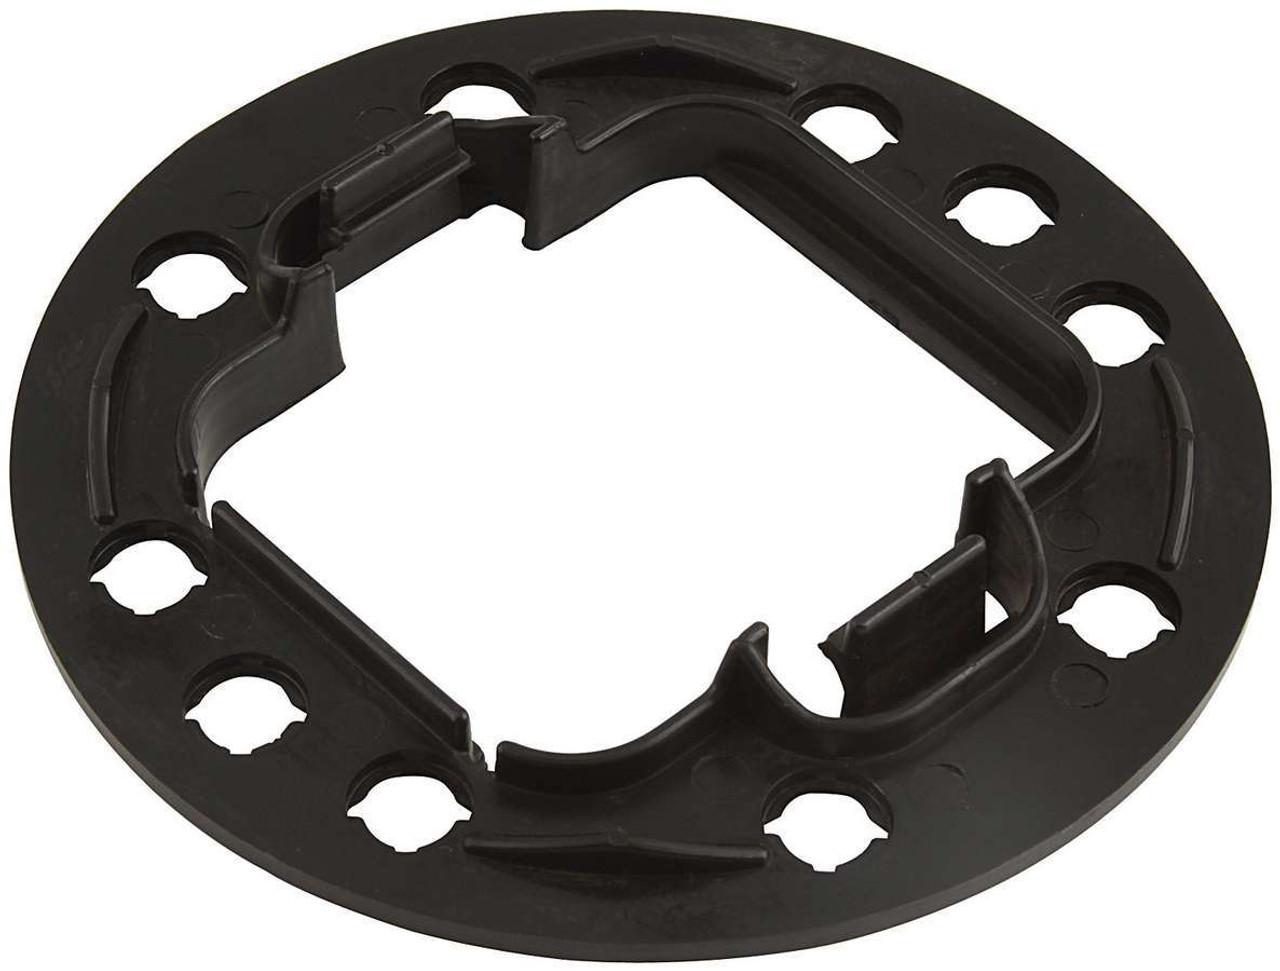 hei wire retainer black all81213 allstar performance [ 1280 x 971 Pixel ]